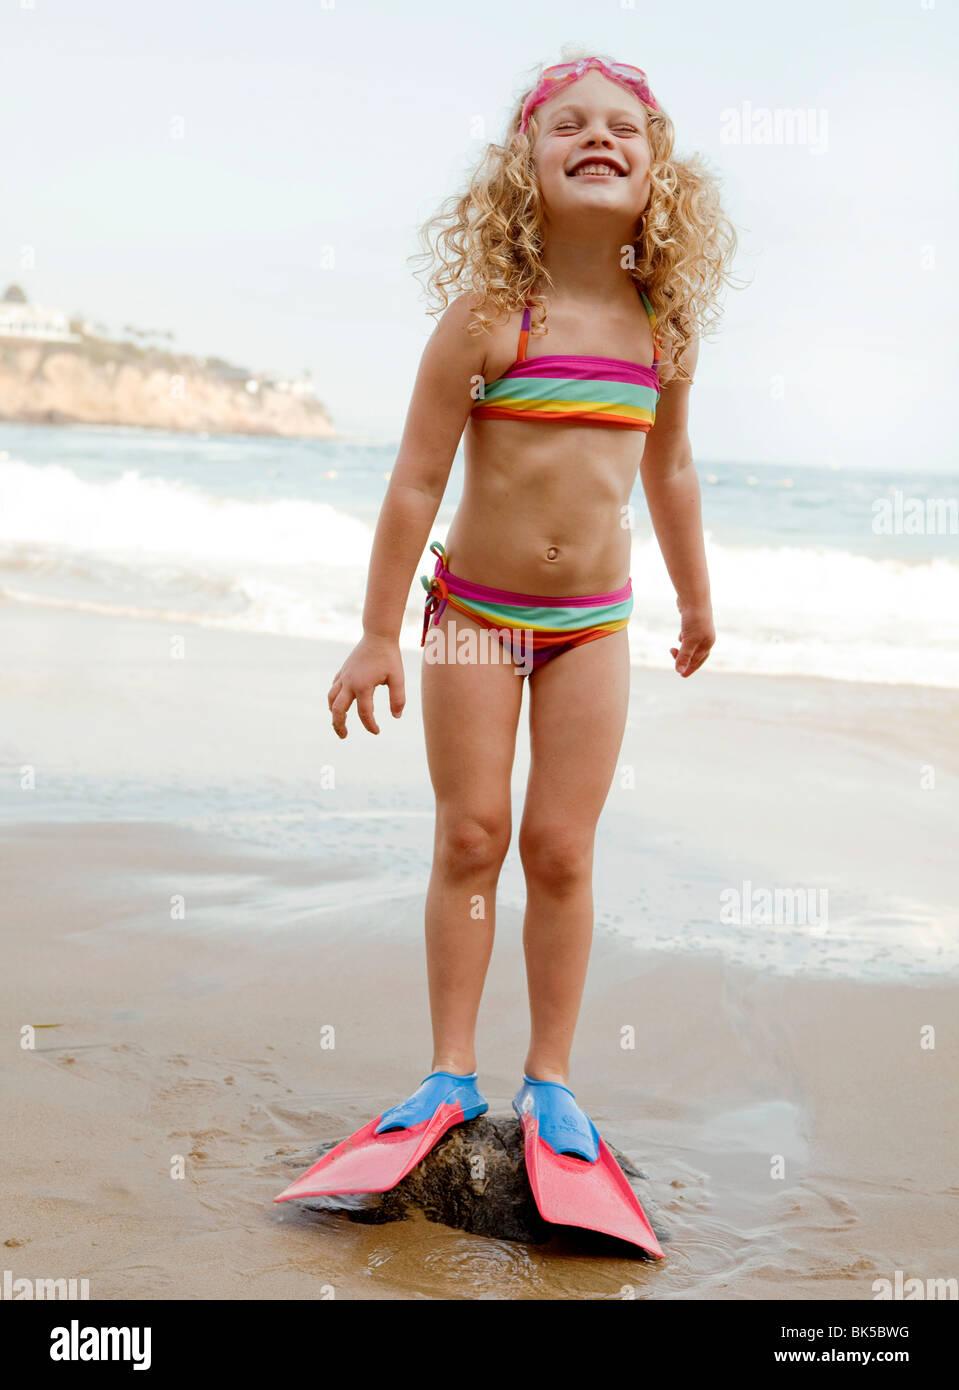 Girl in striped bikini and flippers at beach - Stock Image